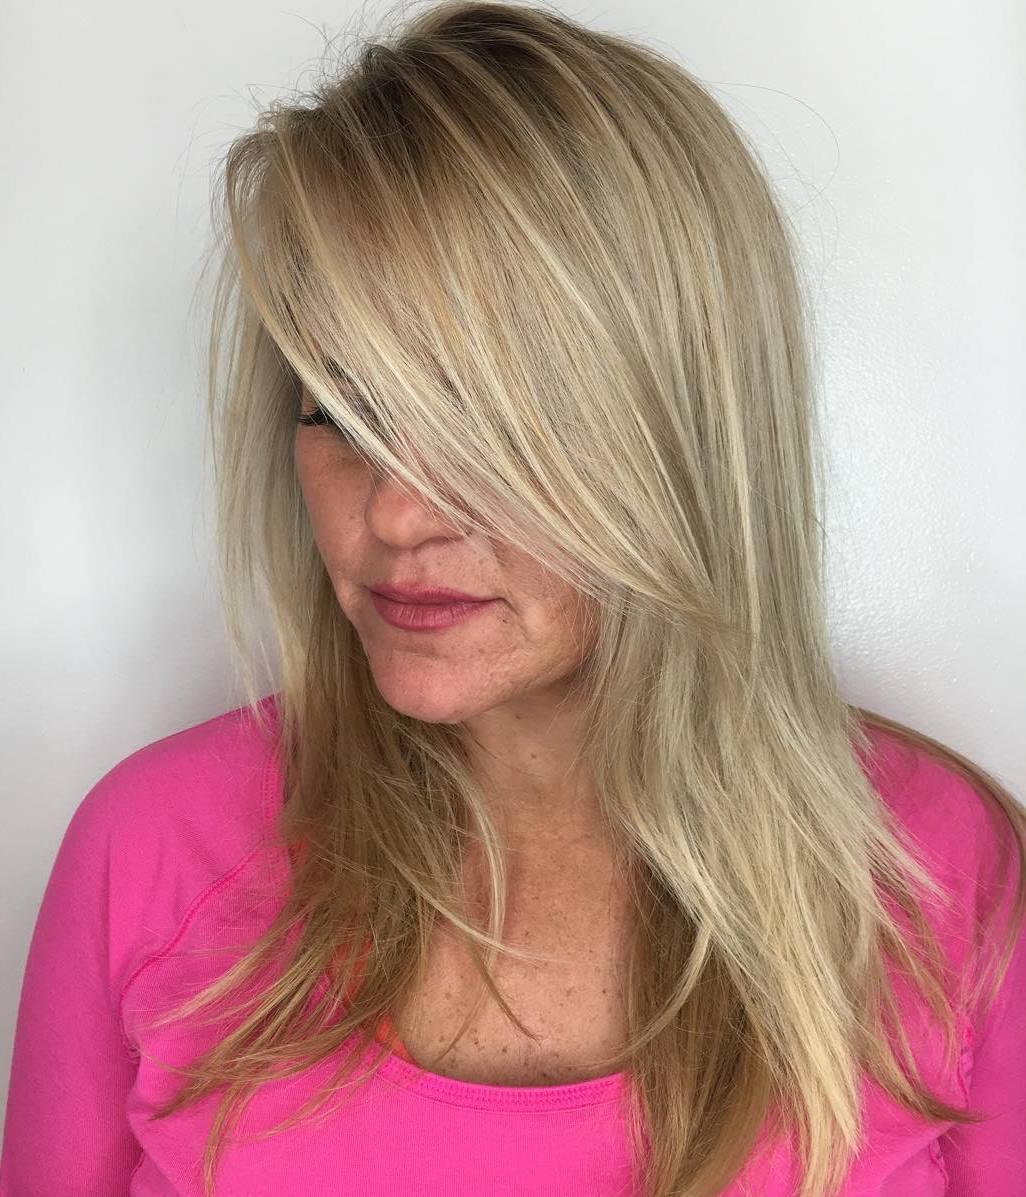 65 Devastatingly Cool Haircuts For Thin Hair